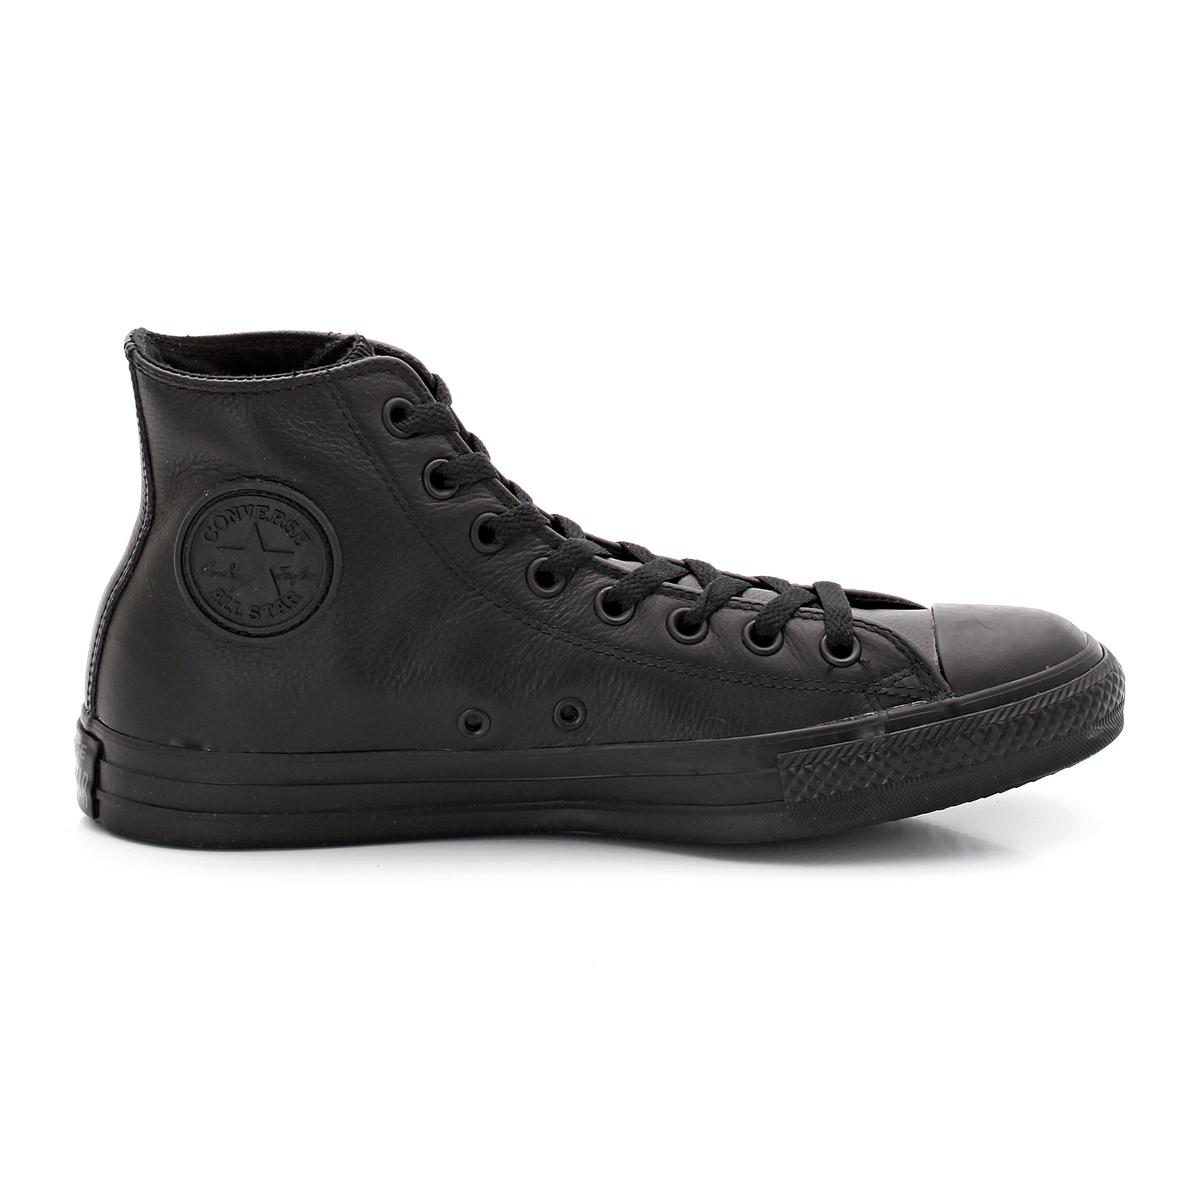 Zapatillas de caña alta Chuck Taylor All Star Hi Mono cuir